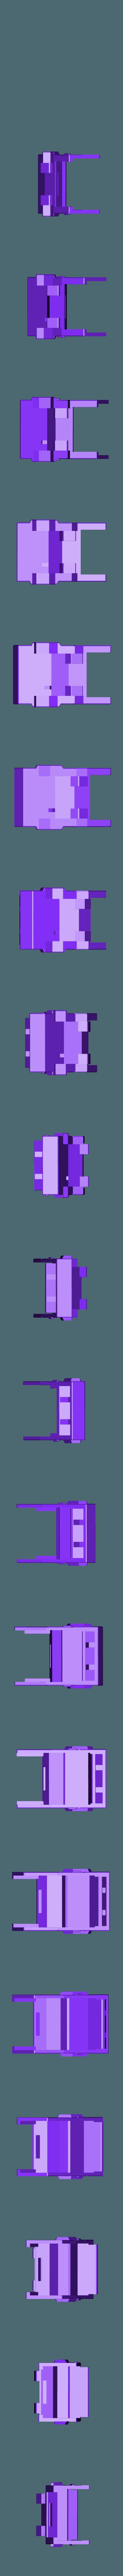 2_3wheels_car_Body.stl Download free STL file Classic 3 Wheels Car no support • Design to 3D print, Toymakr3D